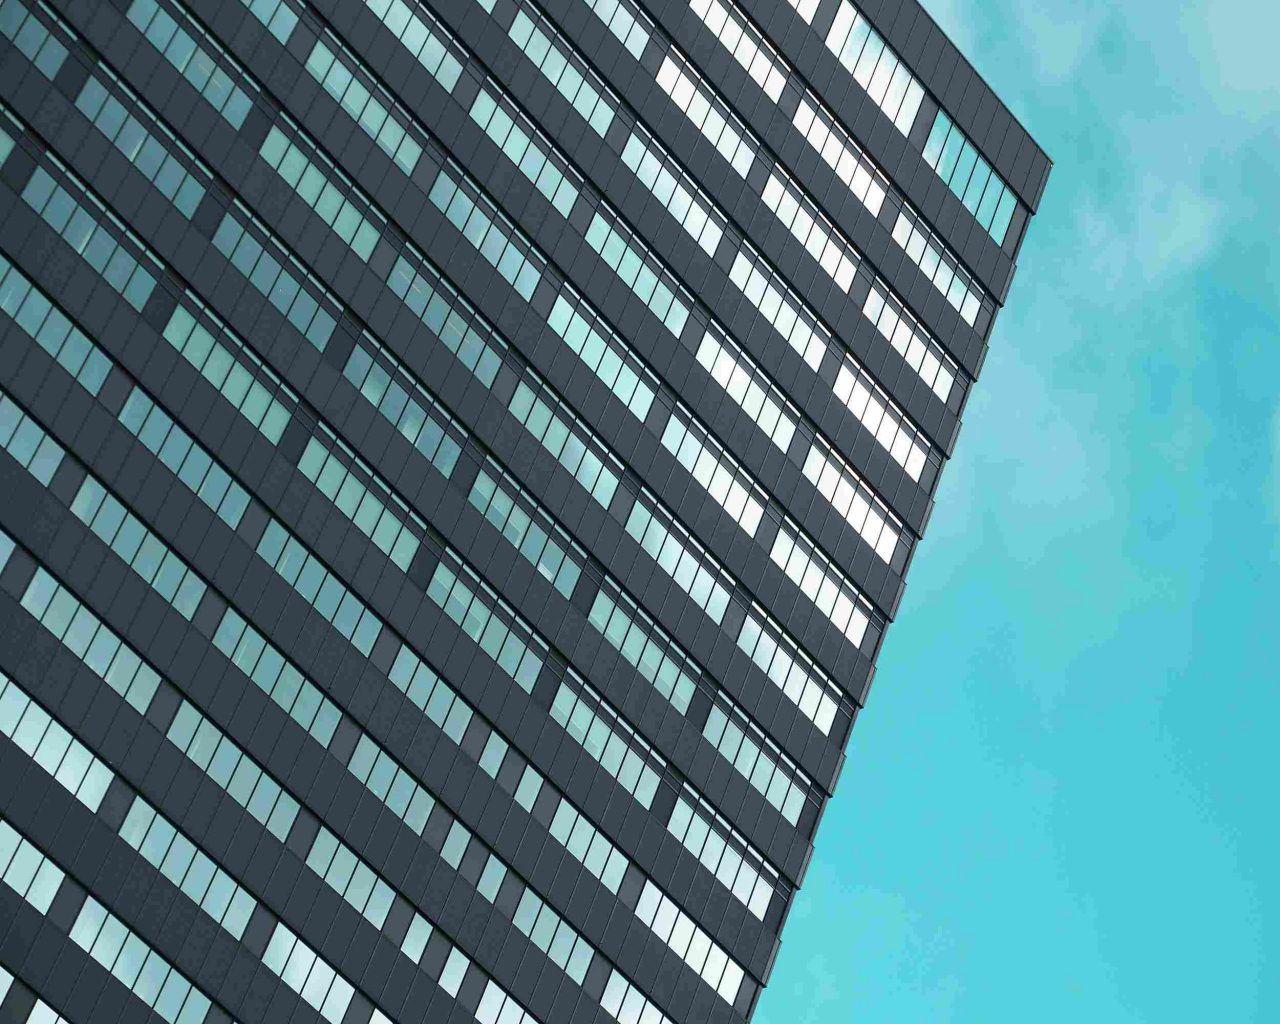 portfolio_15-1280x1024.jpg